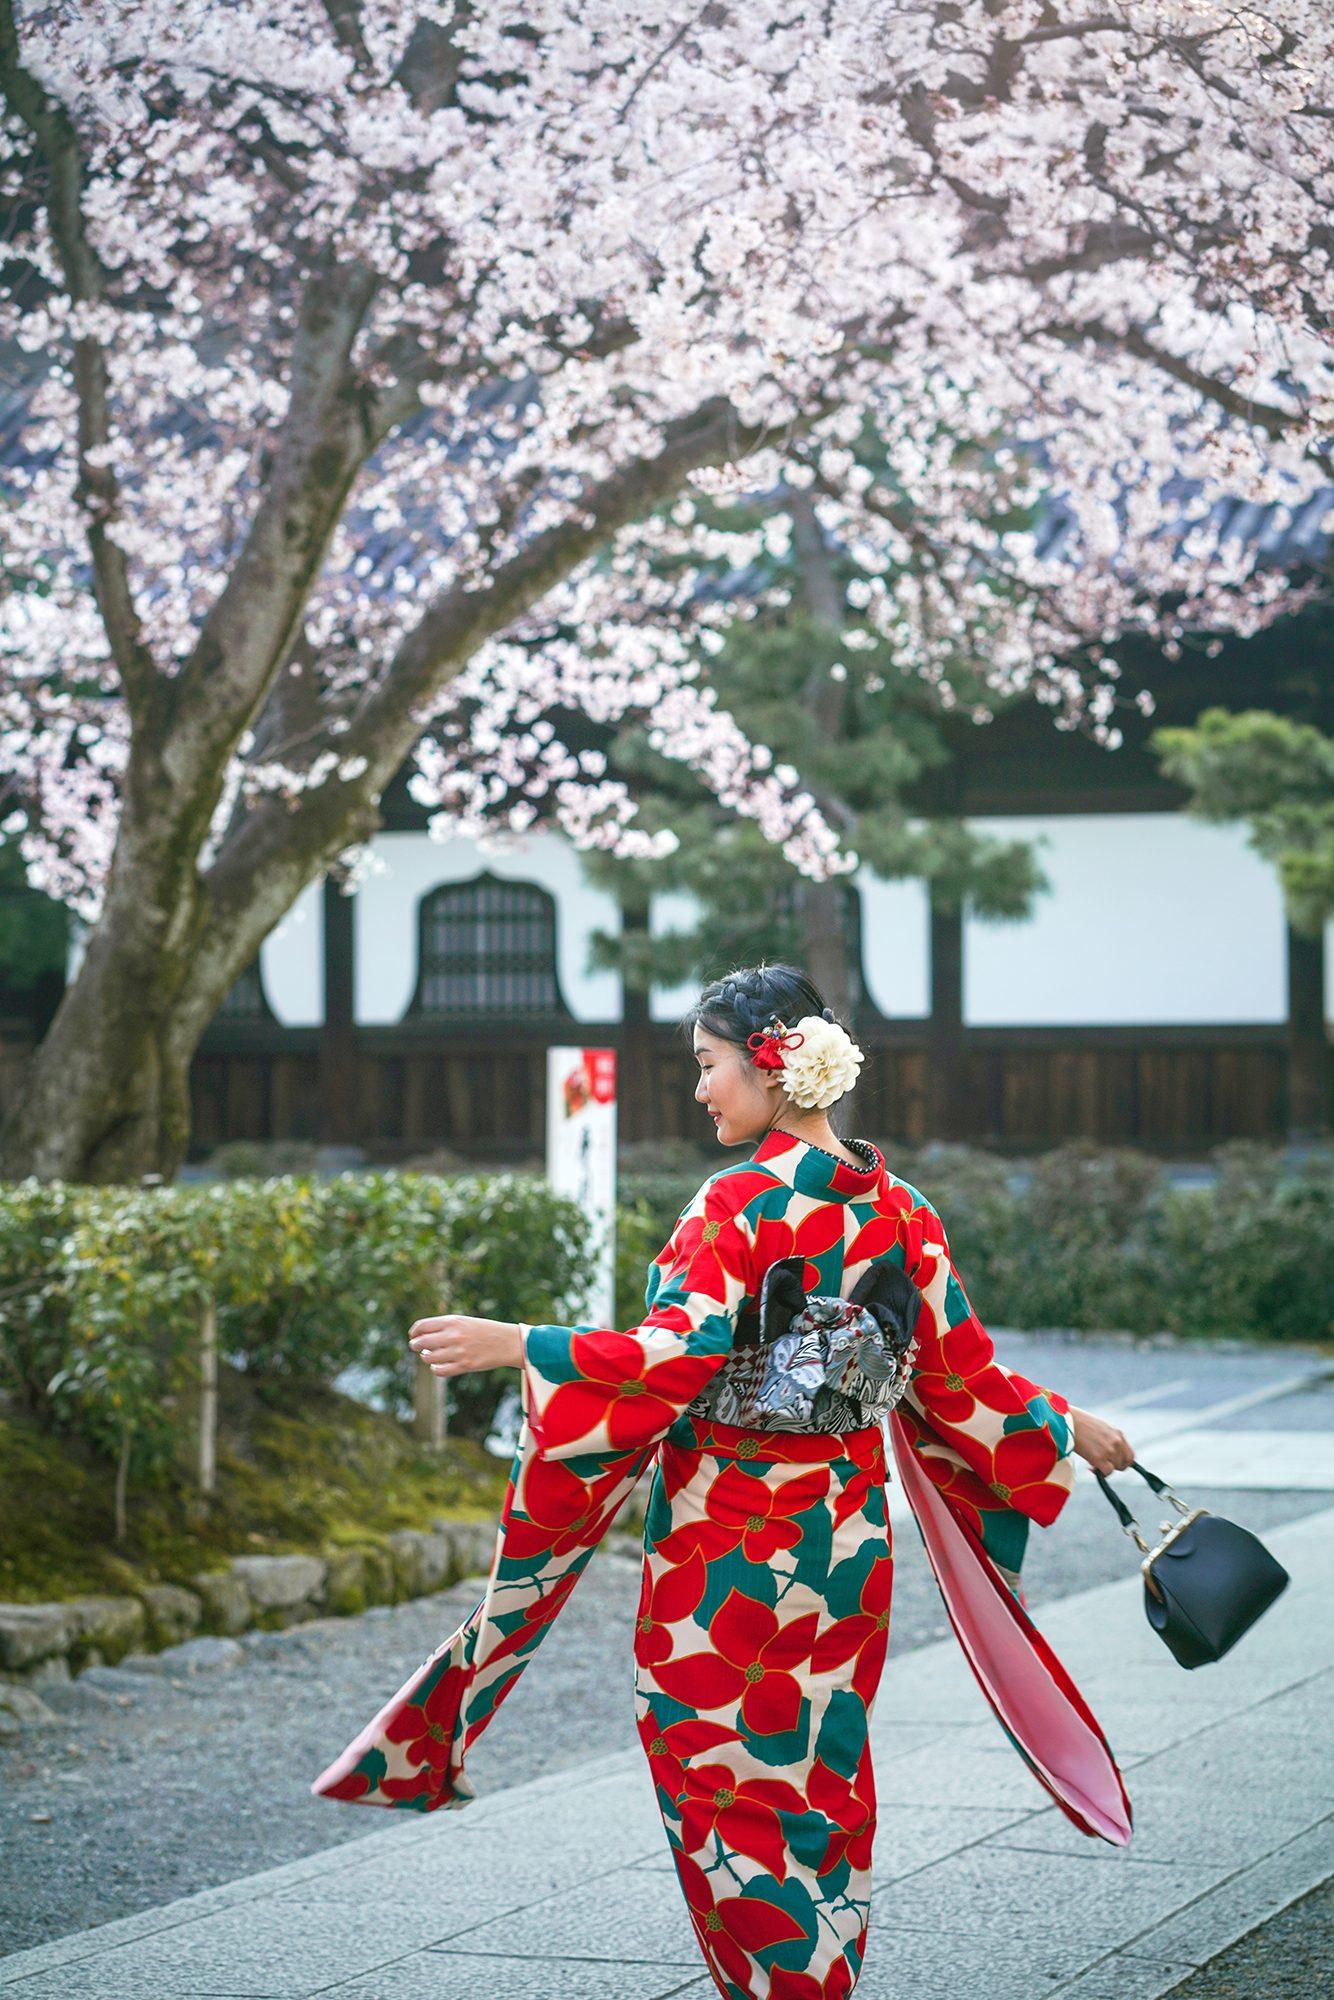 Furisode kimono rental from Kimono Rental Wargo in Kyoto.